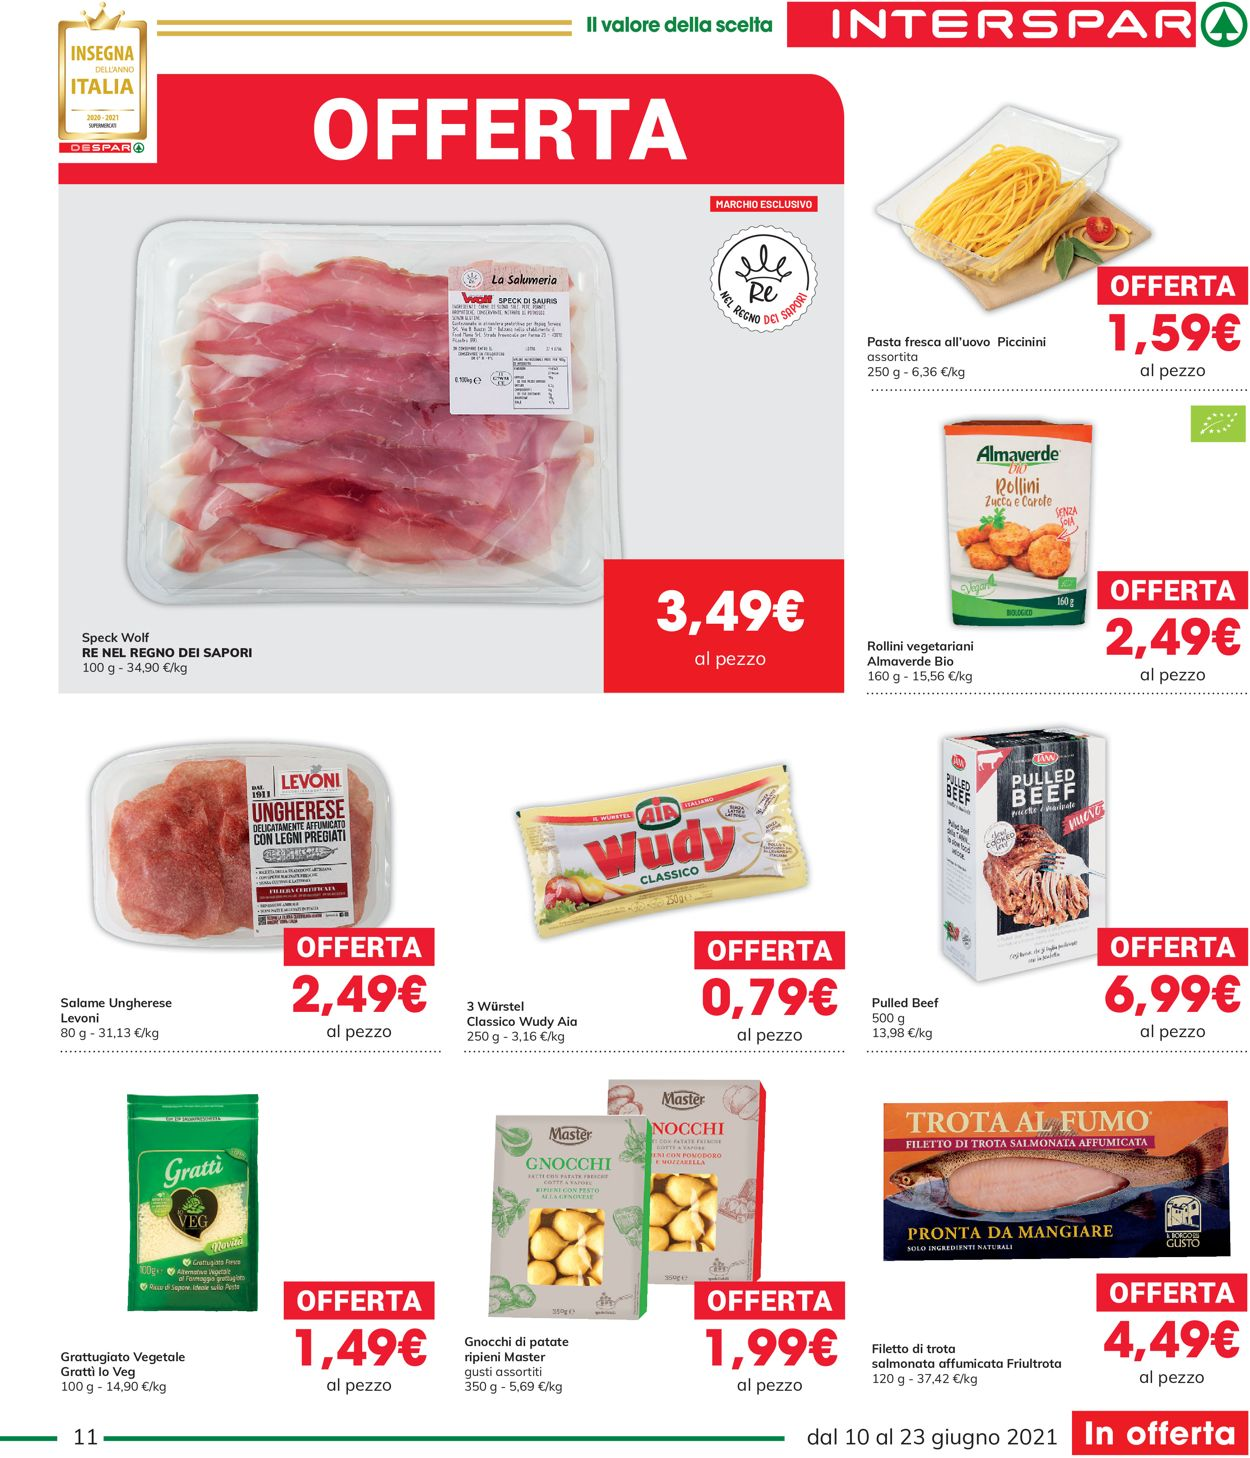 Volantino Interspar - Offerte 10/06-23/06/2021 (Pagina 11)